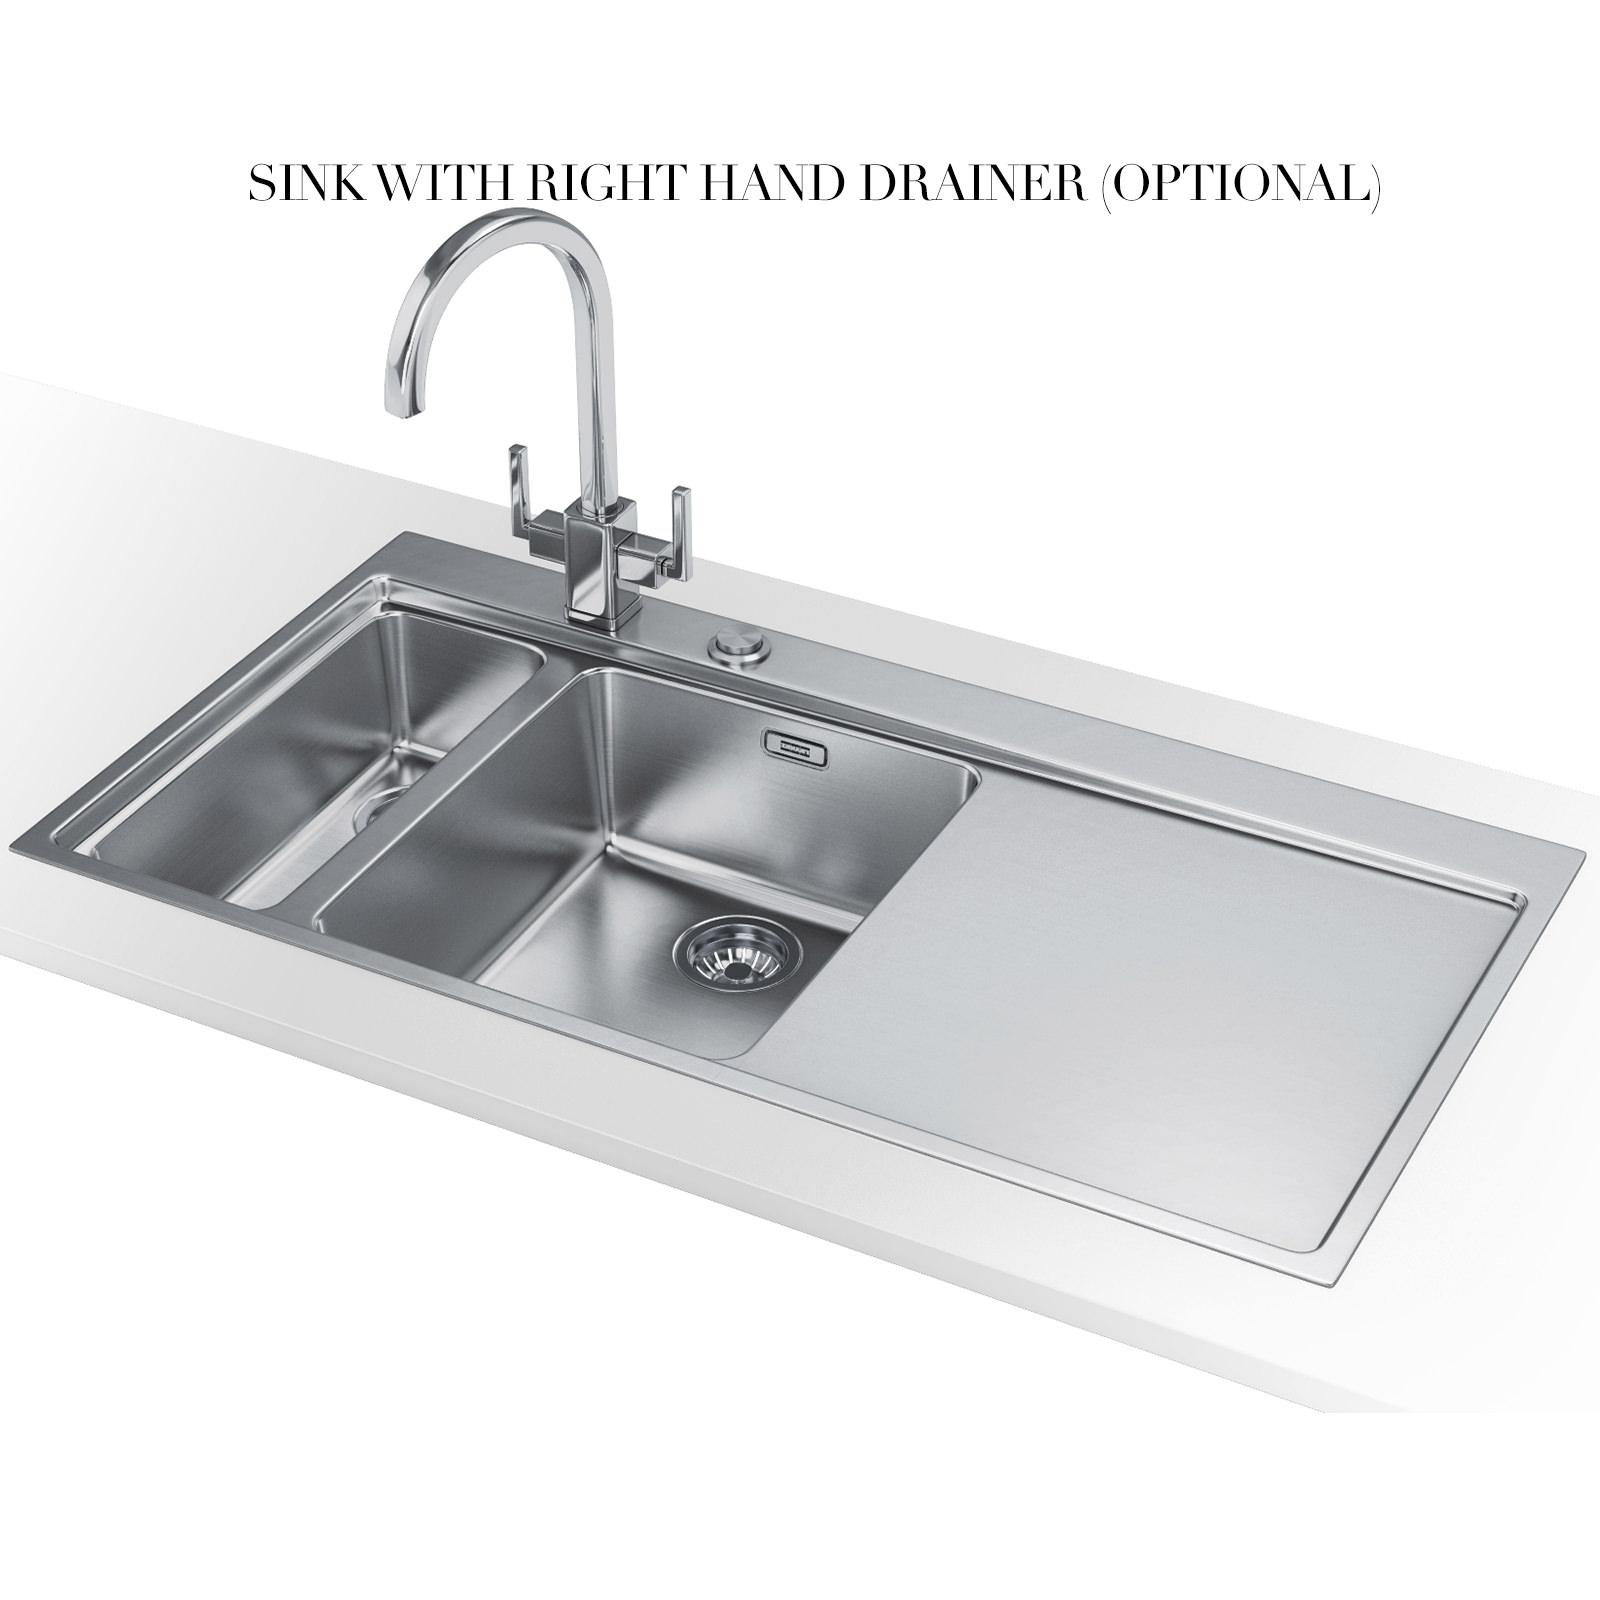 Franke Sink Tops : ... of Franke Mythos MMX 261 Slim-Top 1.5 Bowl Stainless Steel Inset Sink